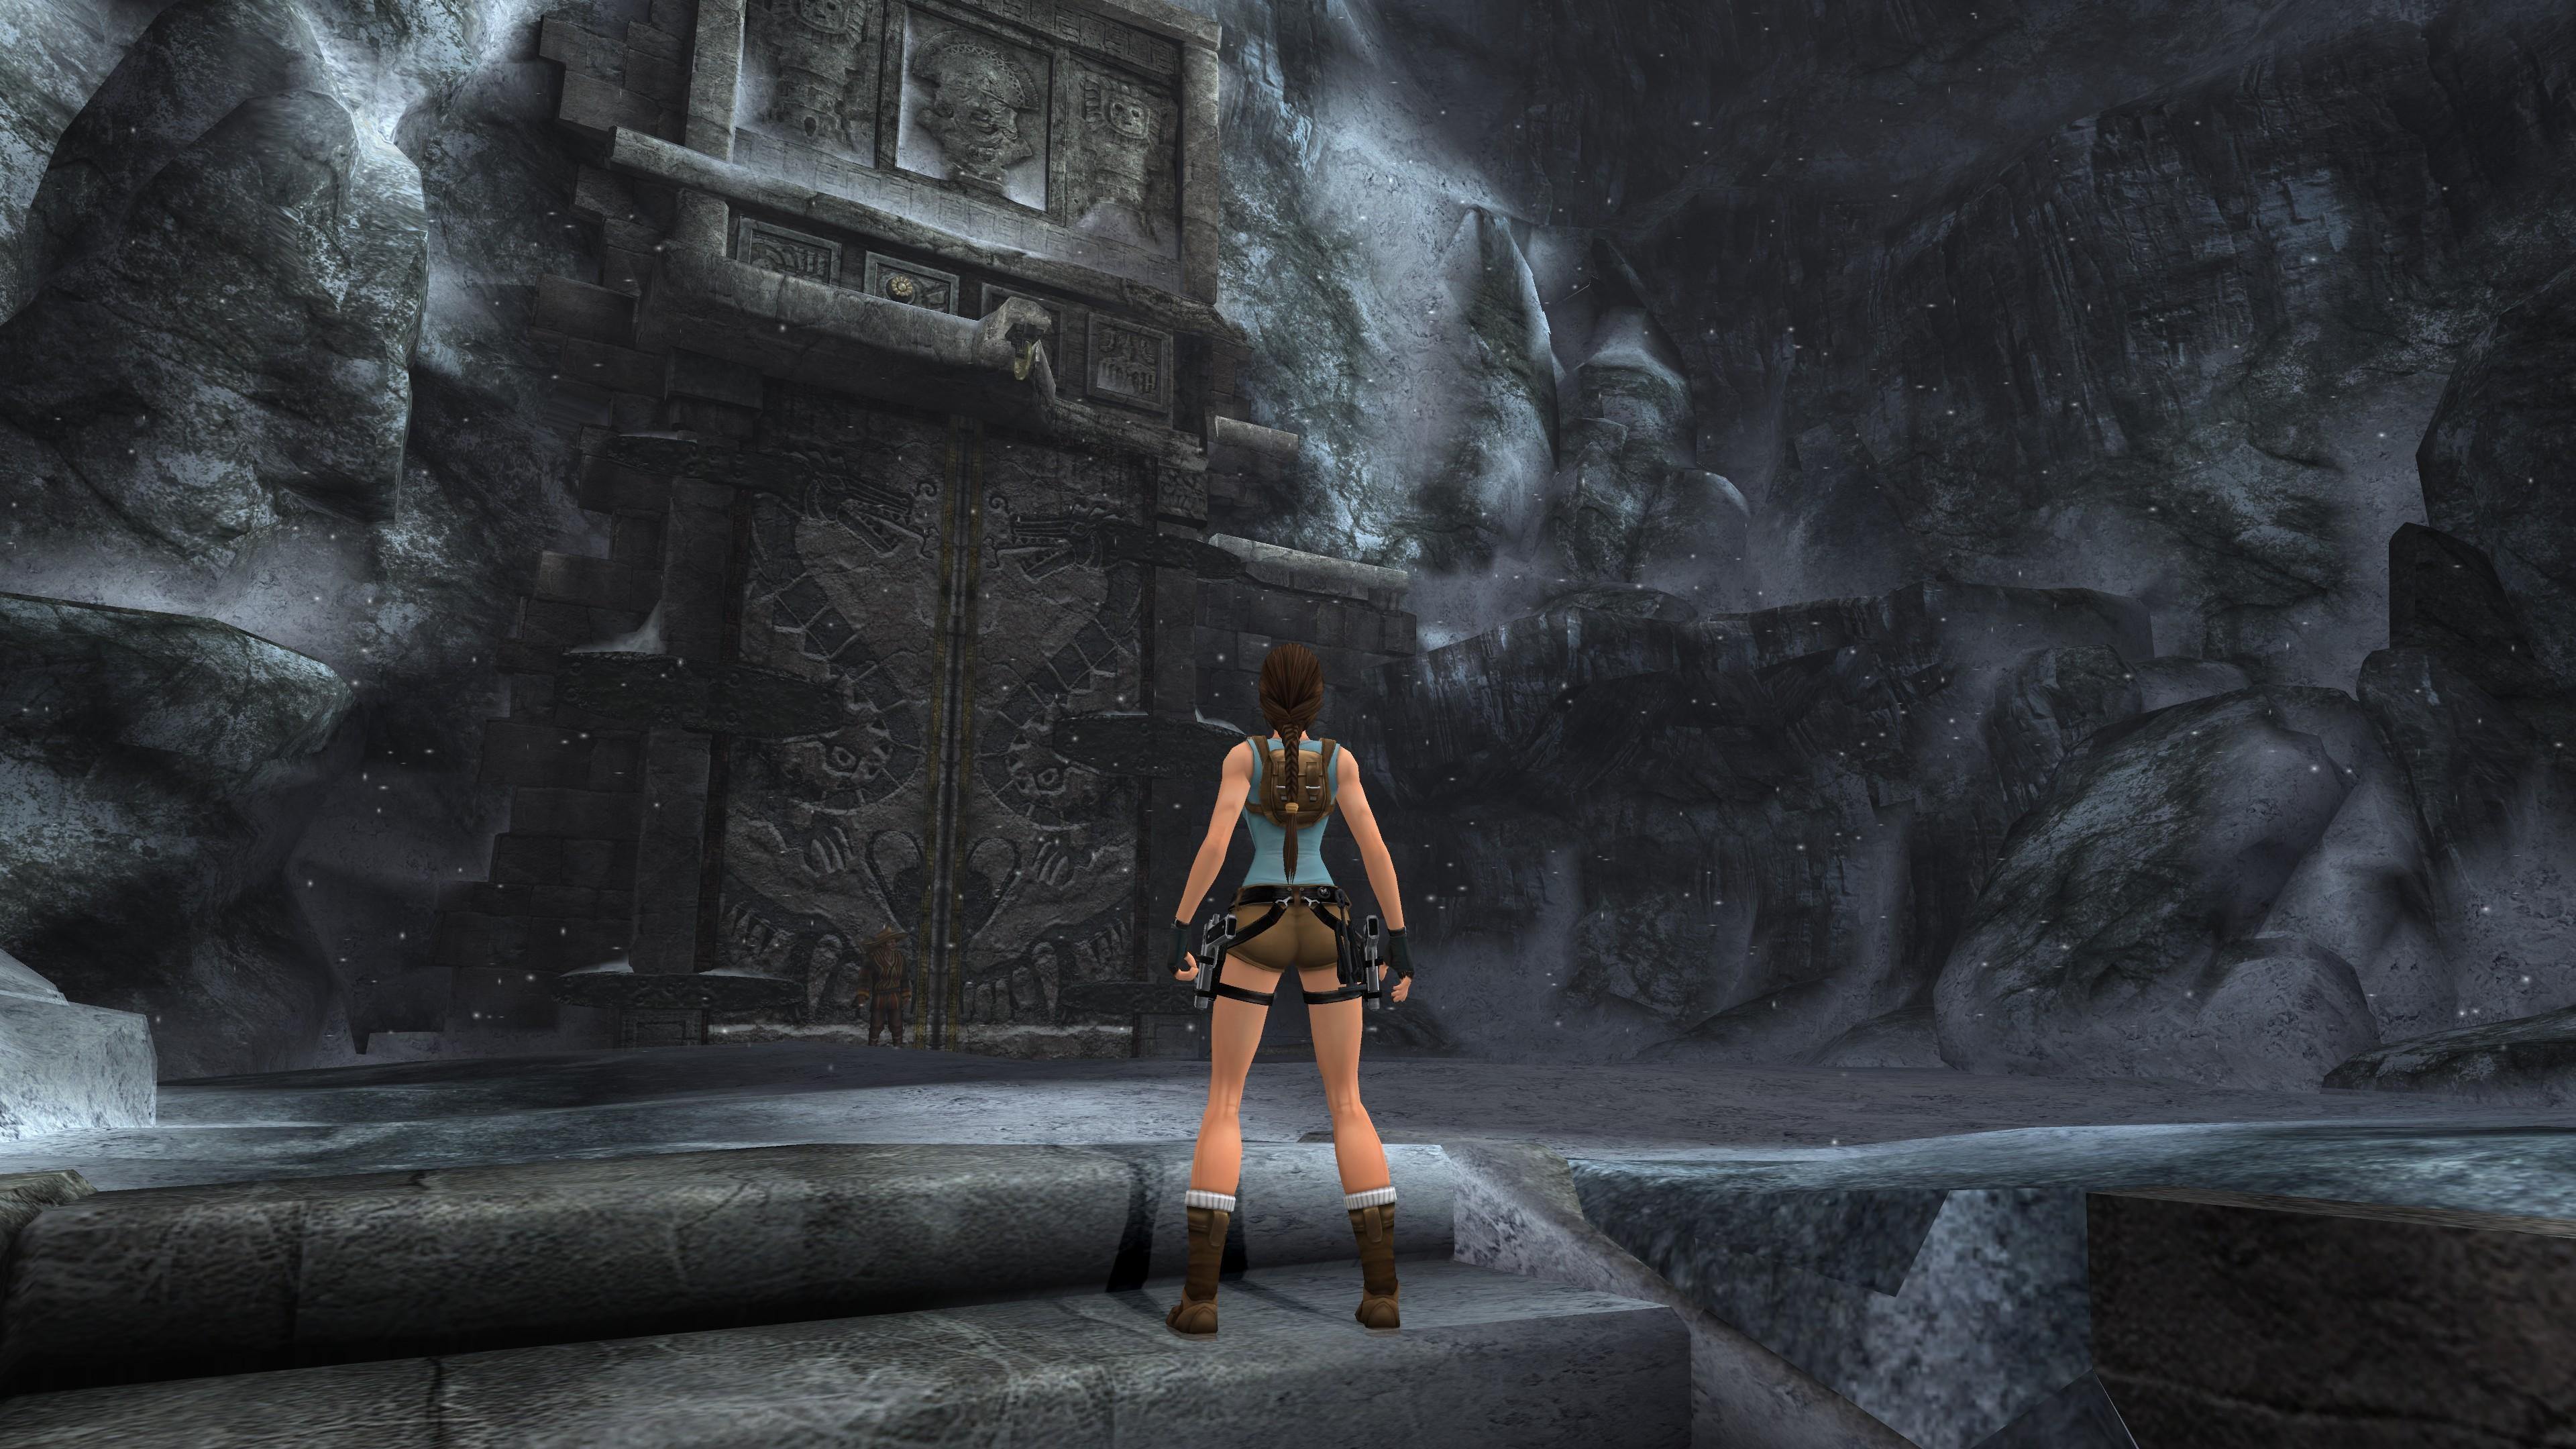 Video Games Lara Croft Tomb Raider Mythology Anniversary Darkness Screenshot Computer Wallpaper Pc Game